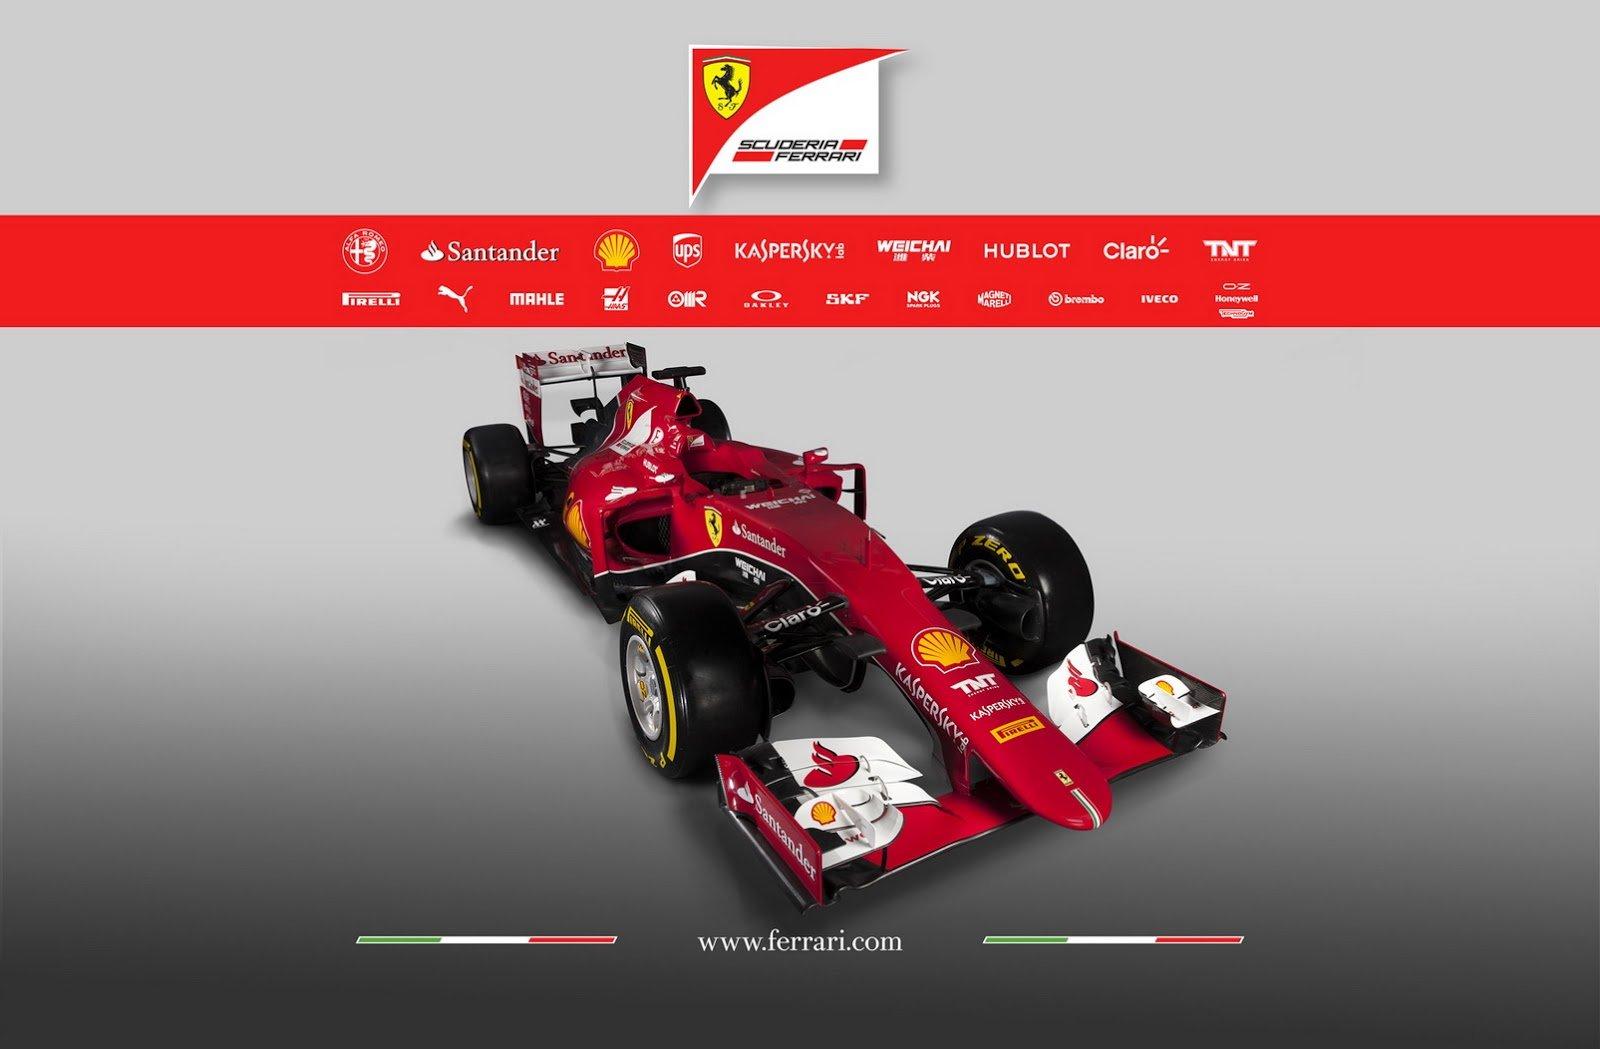 Formula 1 Wallpaper 2015 The Art Mad Wallpapers 1600x1049